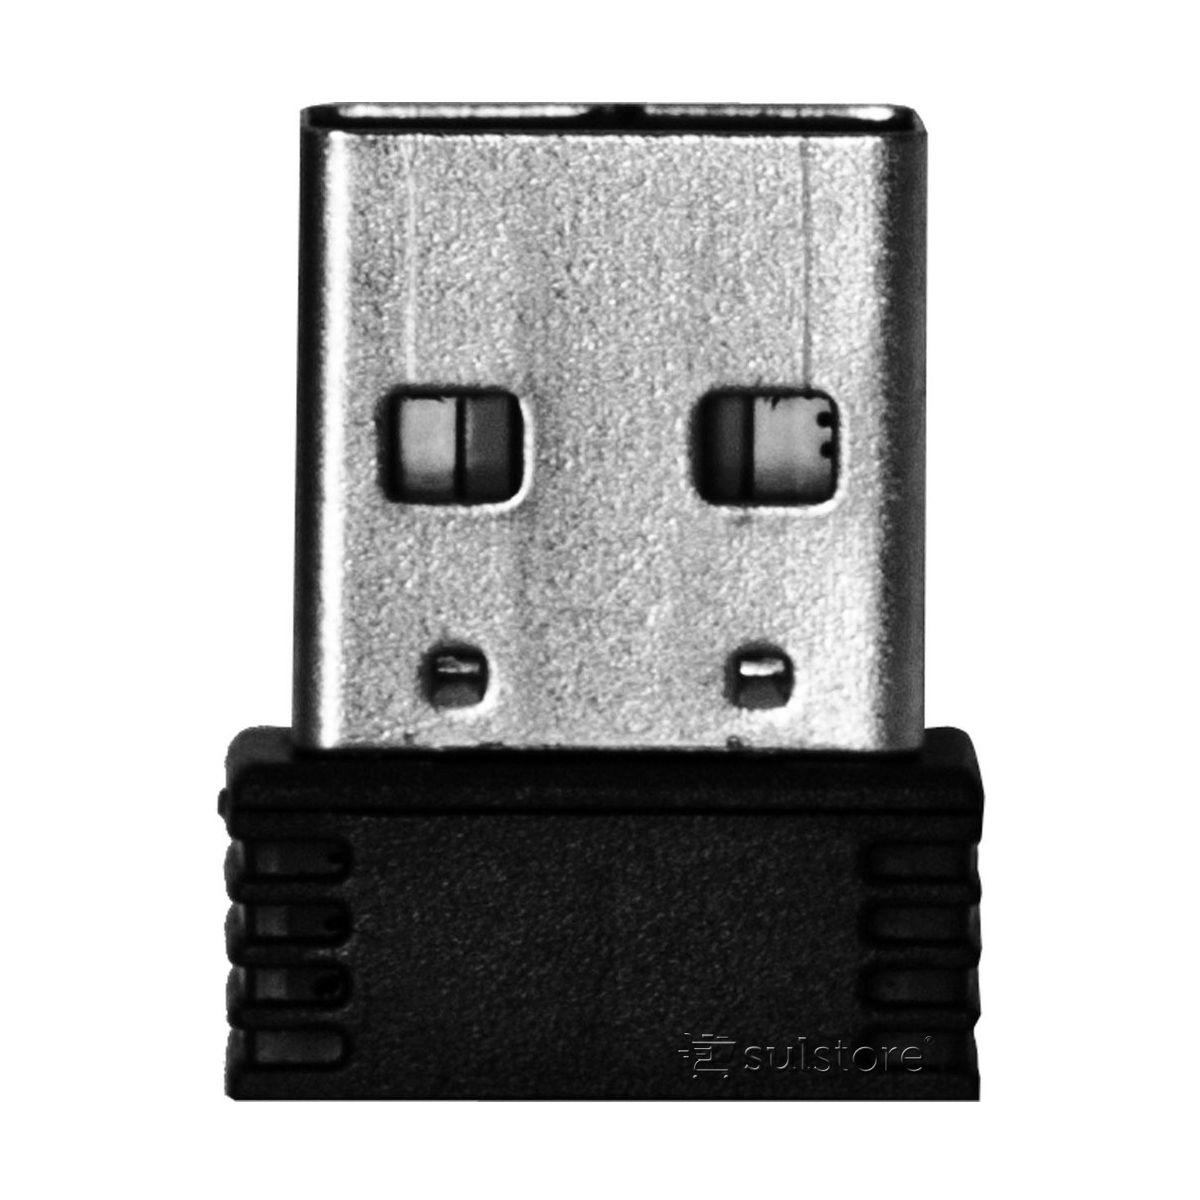 Kit Teclado e Mouse Wireless Sem Fio Preto WCF-102 Fortrek